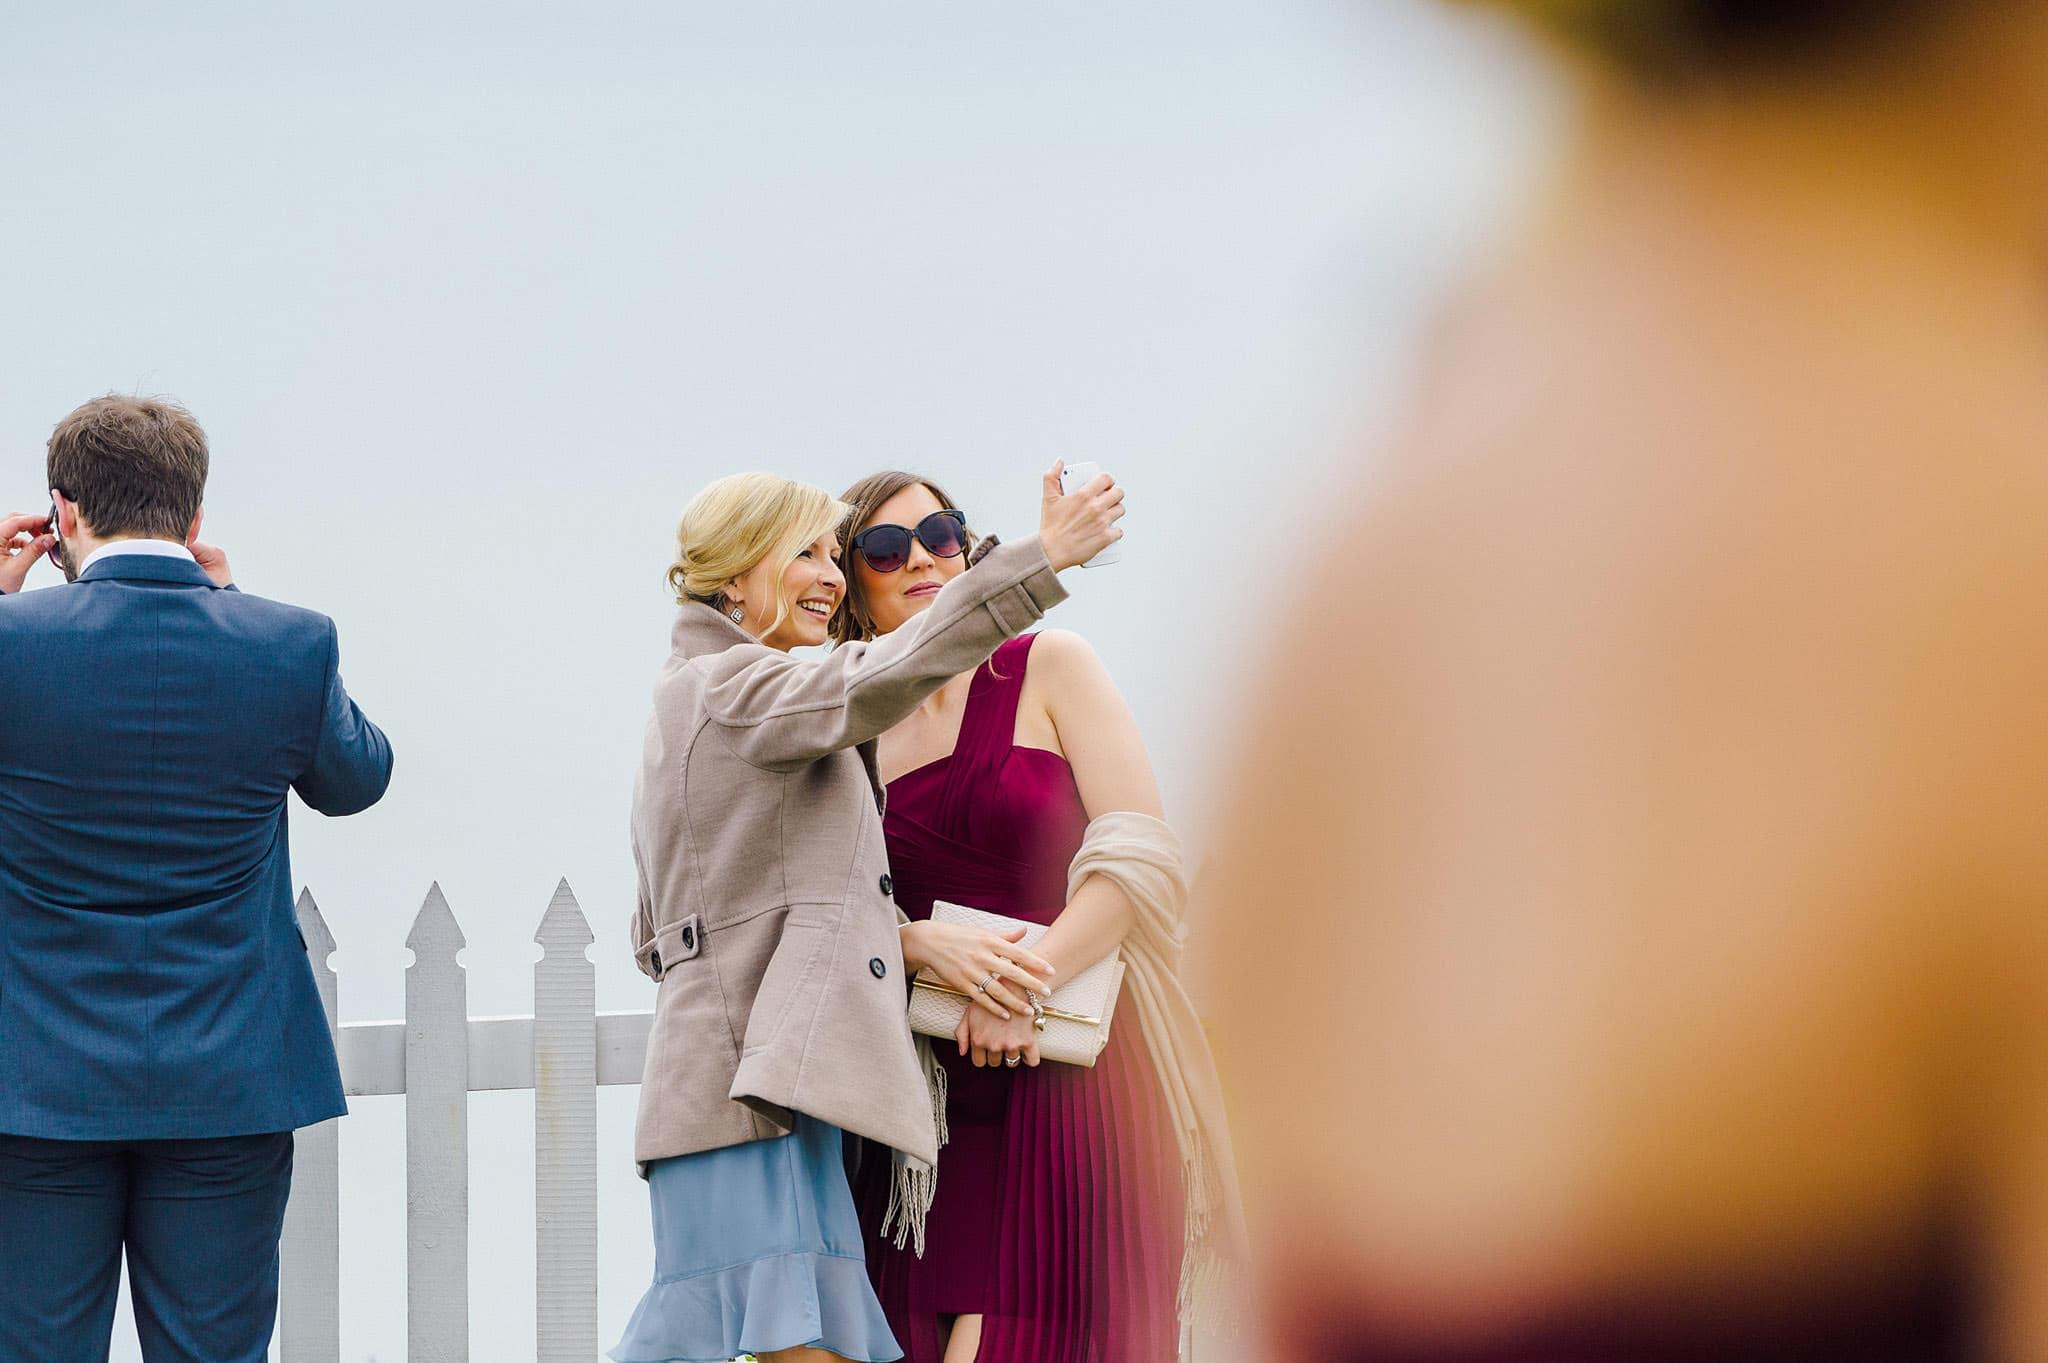 wedding-photographer-aberystwyth-wales (152)